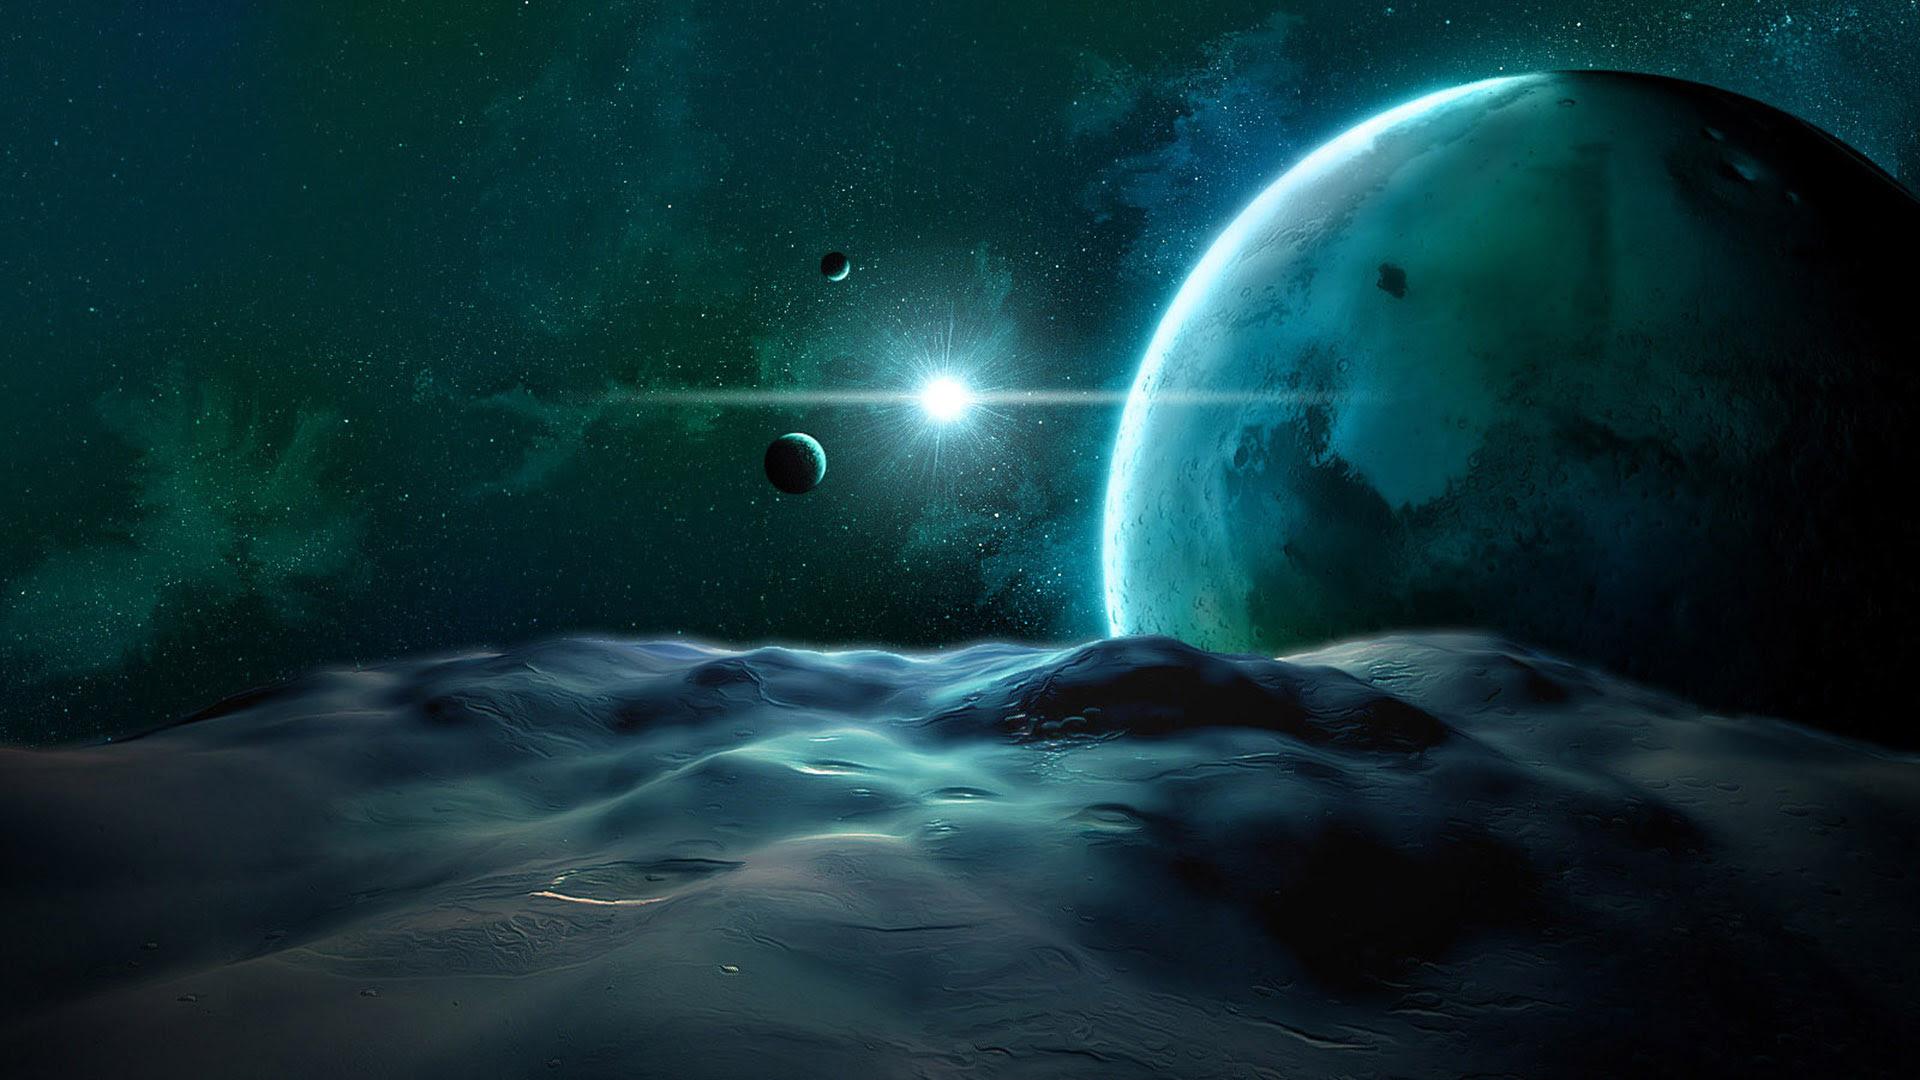 1920x1080 宇宙 銀河 惑星のきれいな壁紙 250 フルhd Naver